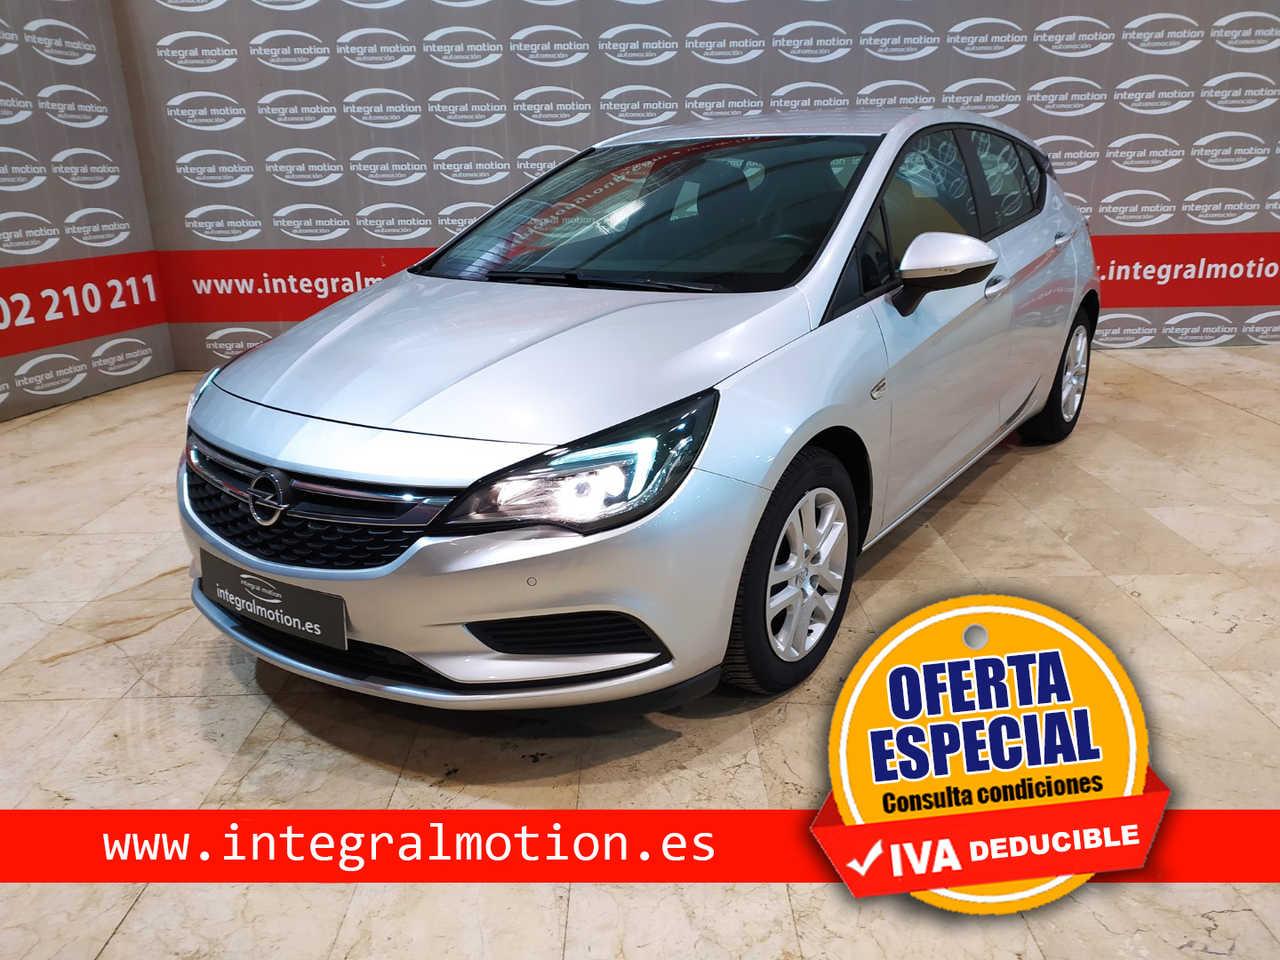 Opel Astra 1.6 CDTI 110CV ecoFlex S/S Edition   - Foto 1